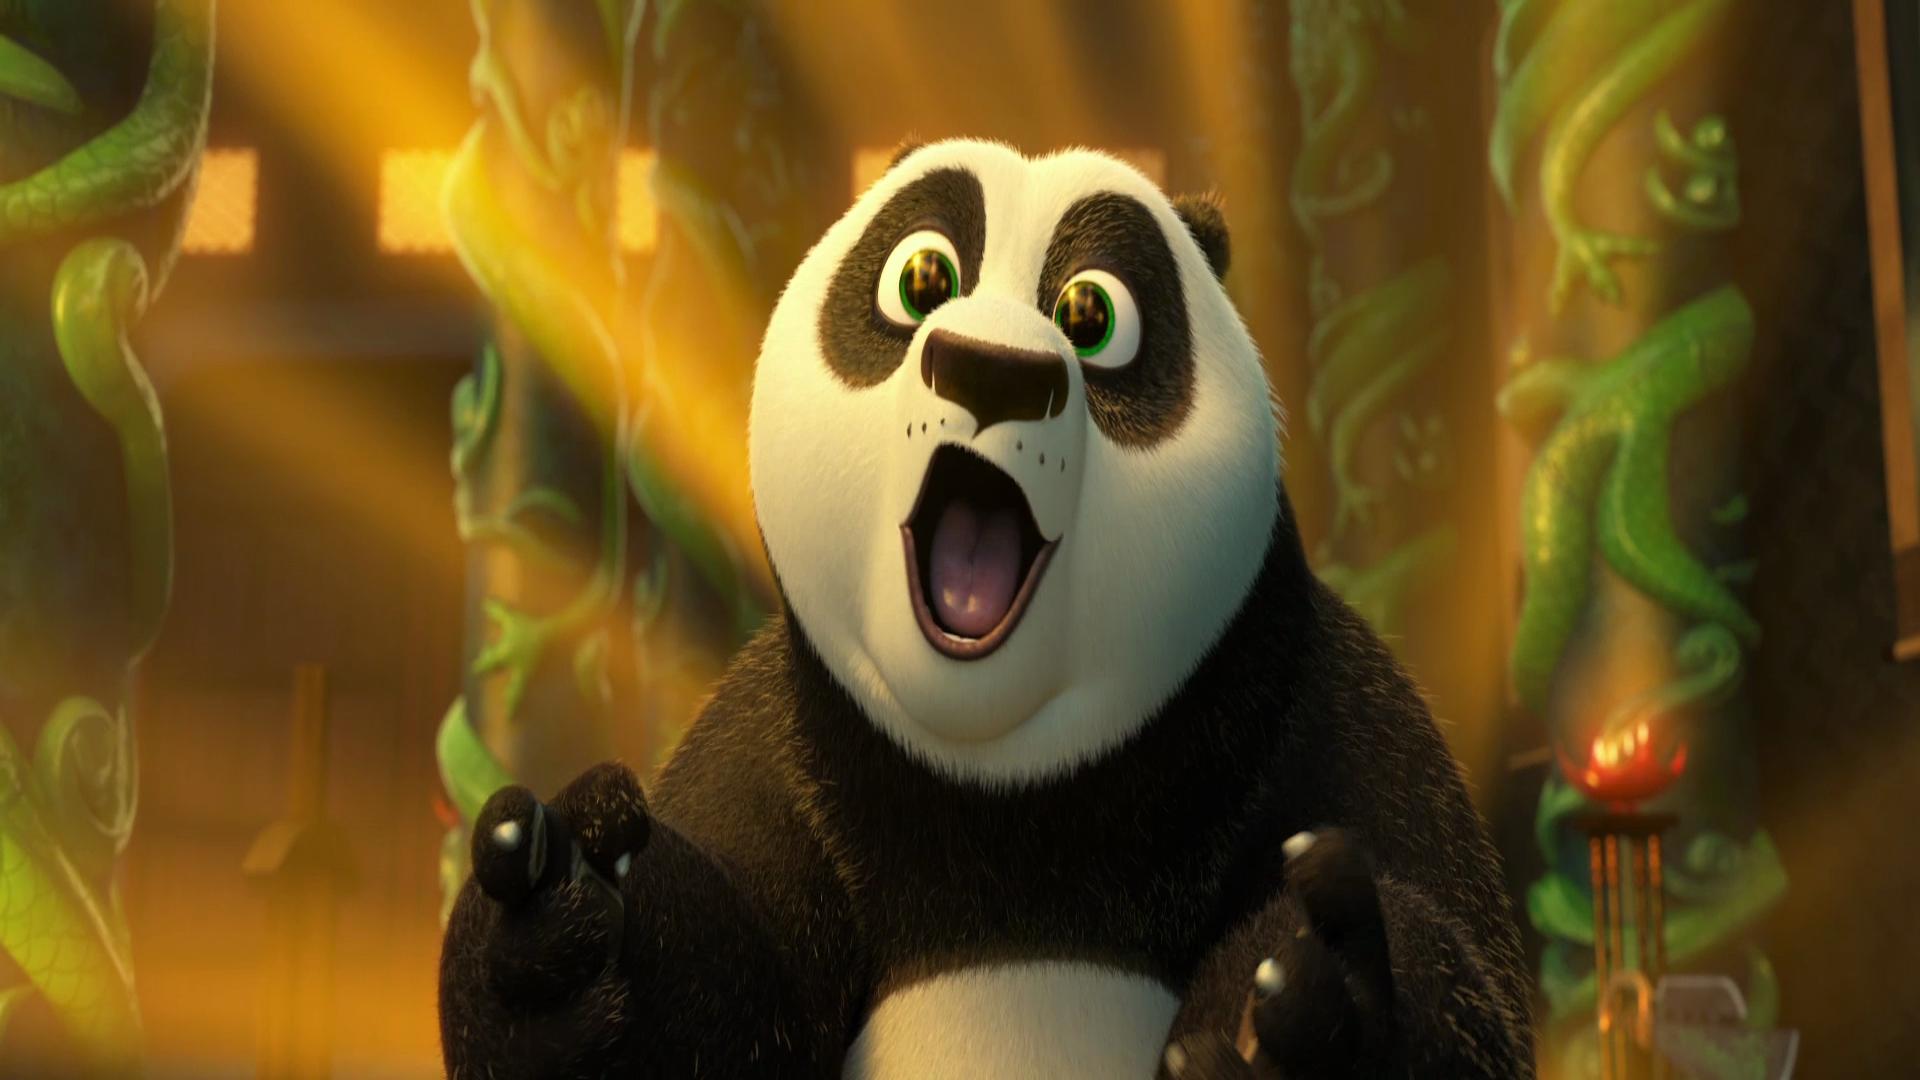 картинки кунфу панда смотреть авито